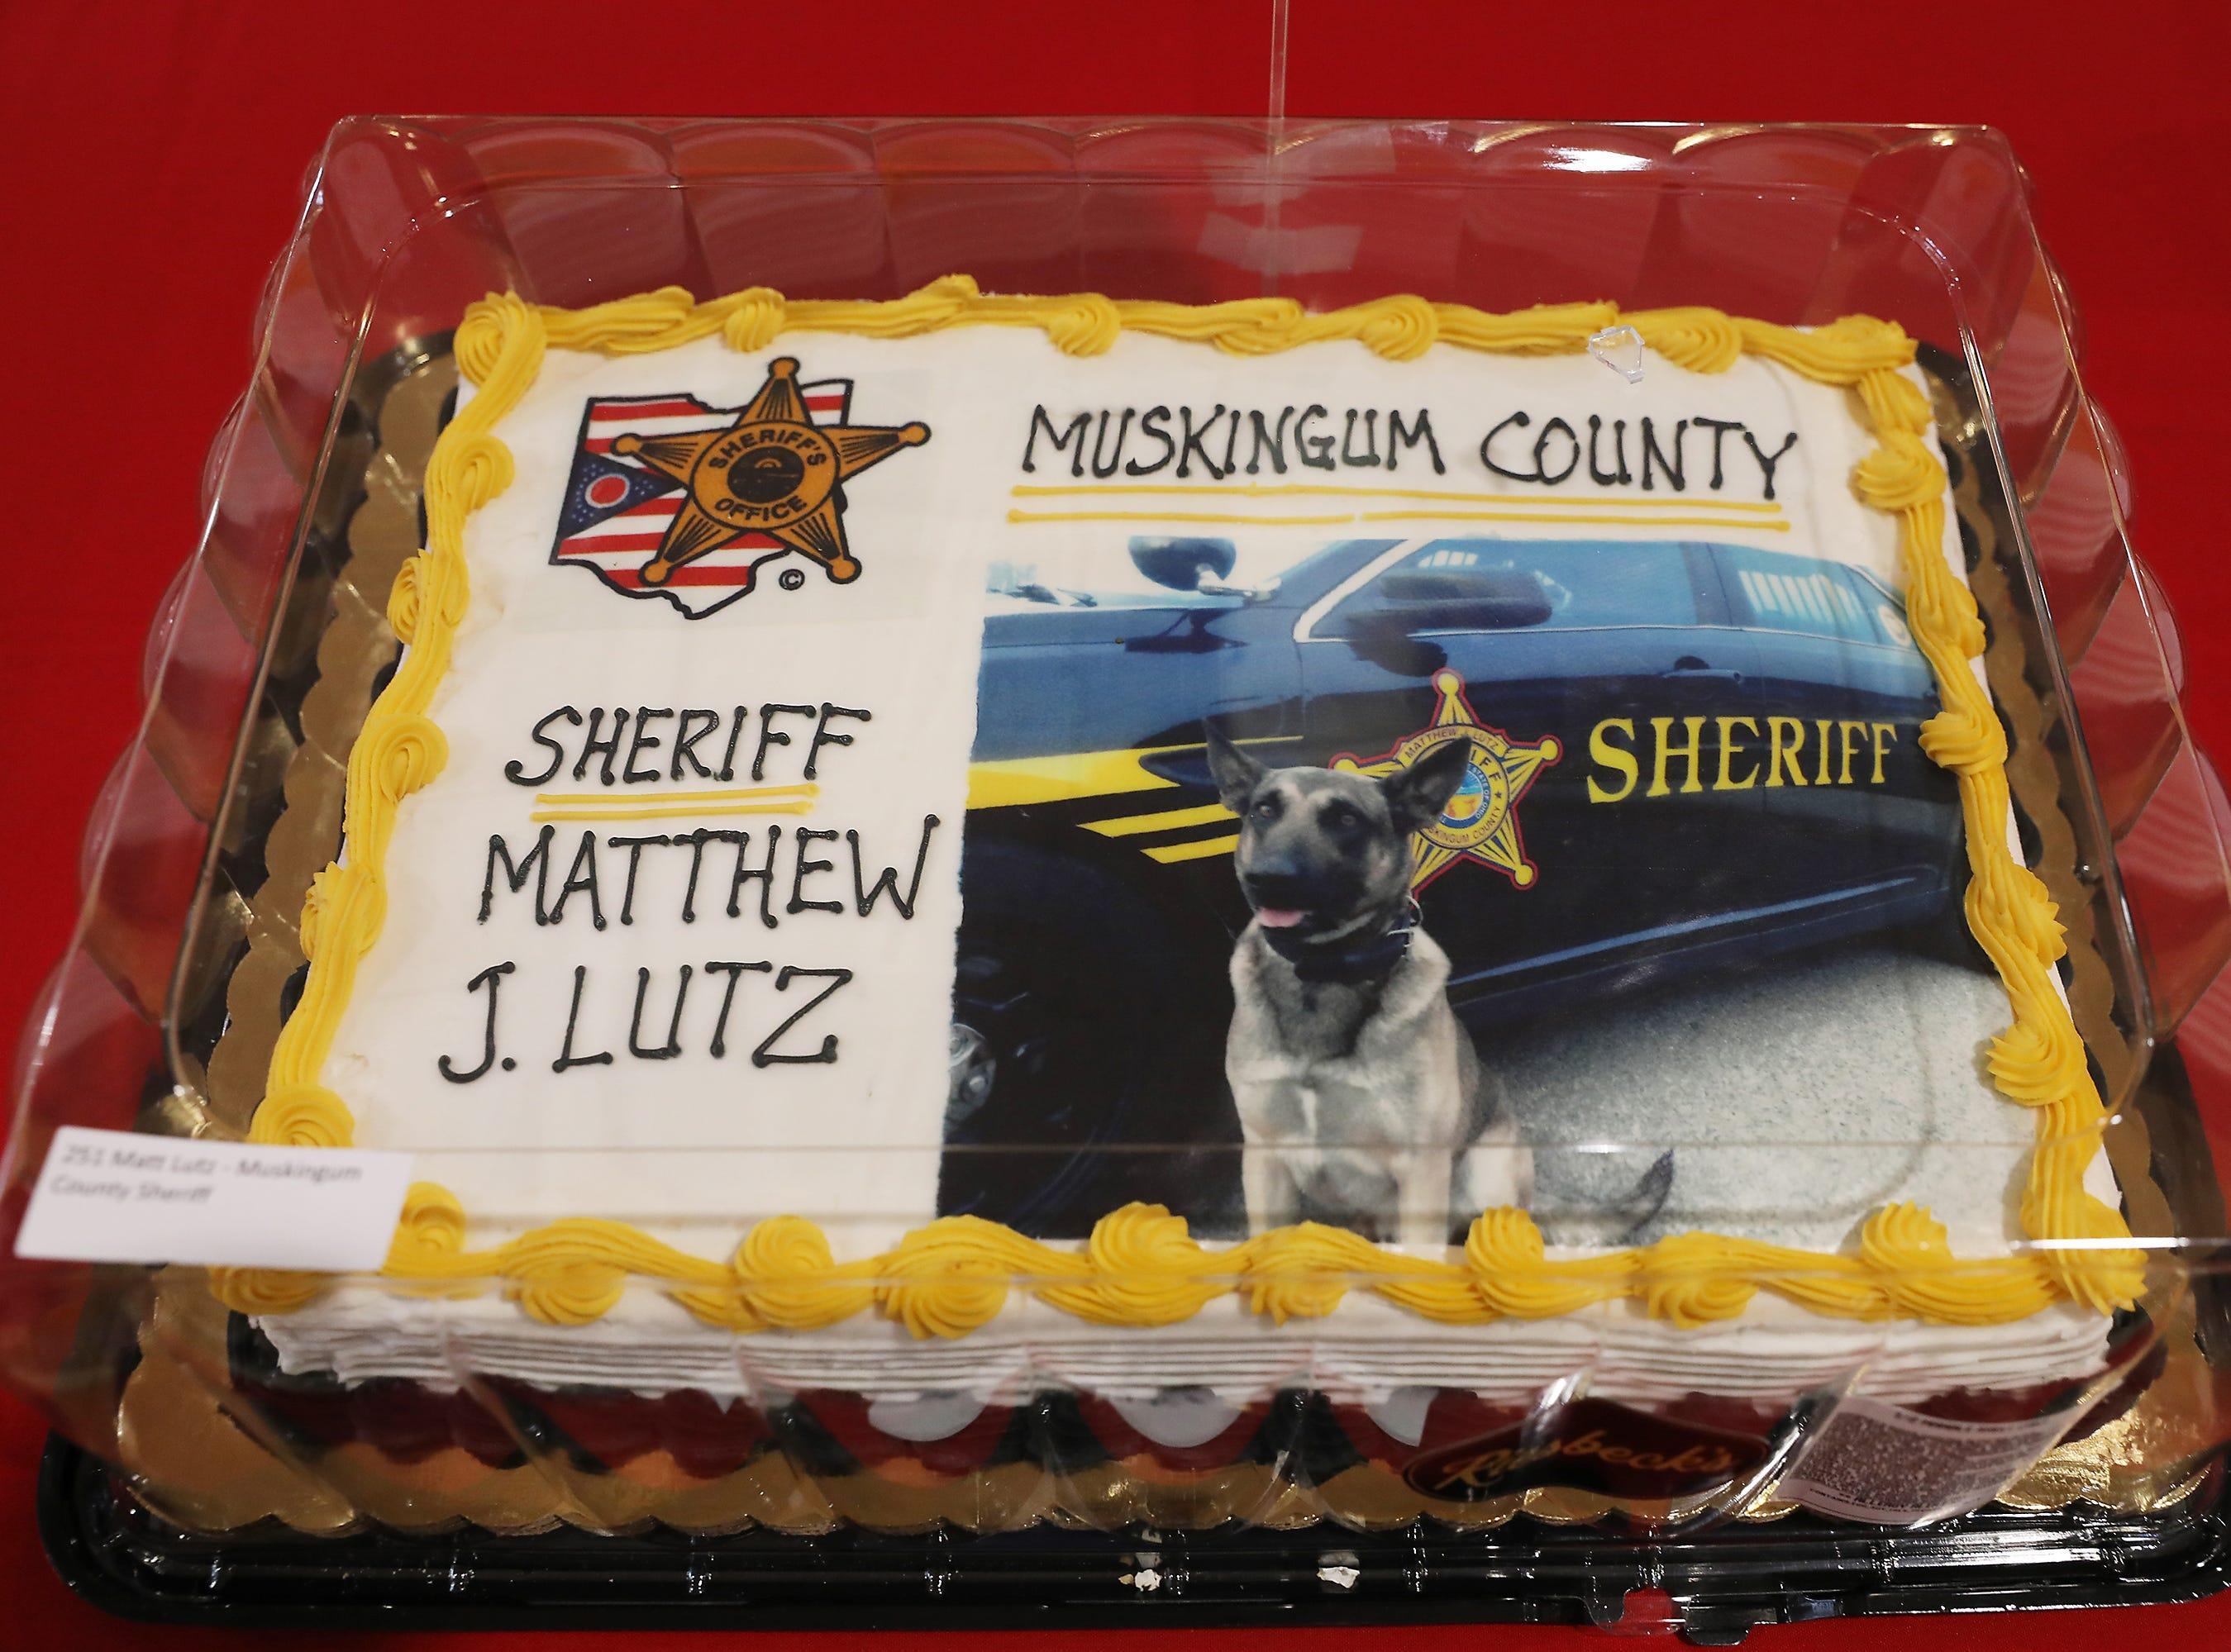 10 A.M. Friday cake 251 Matt Lutz Muskingum County Sheriff - ride to school with a deputy.